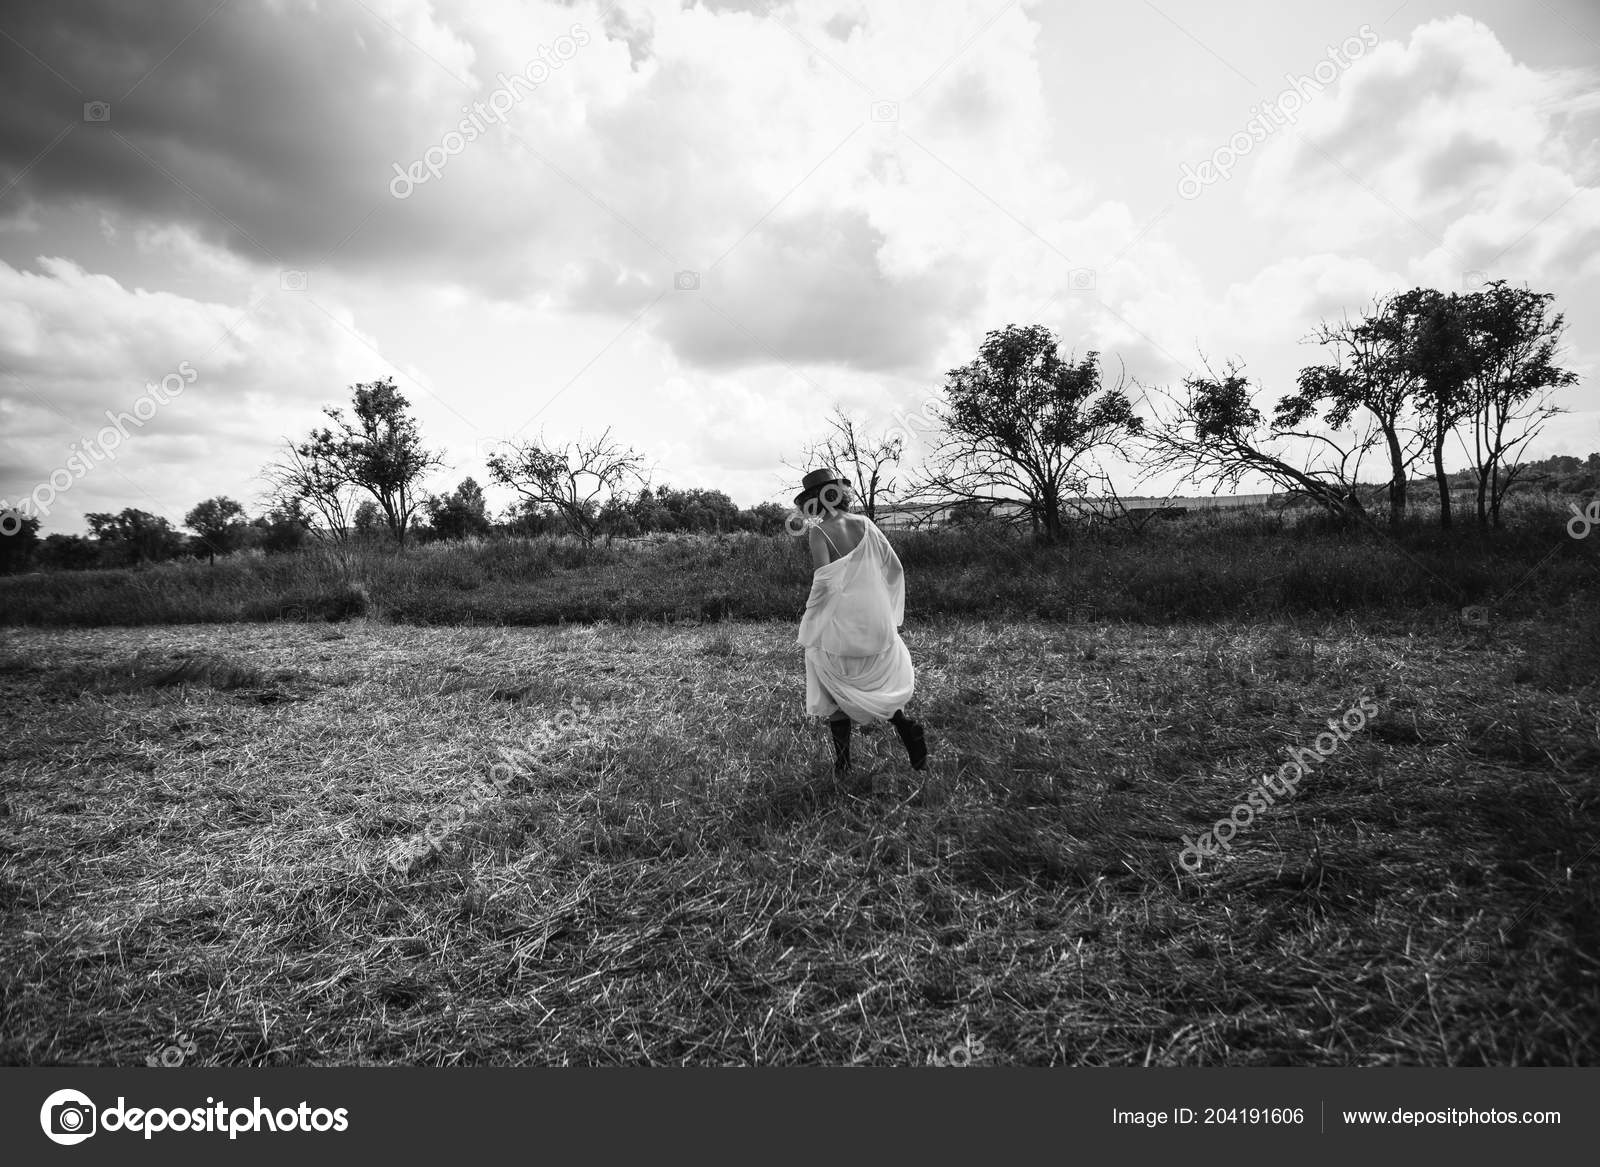 Girl Village Walks Forged Field White Dress Hat Goes Goats